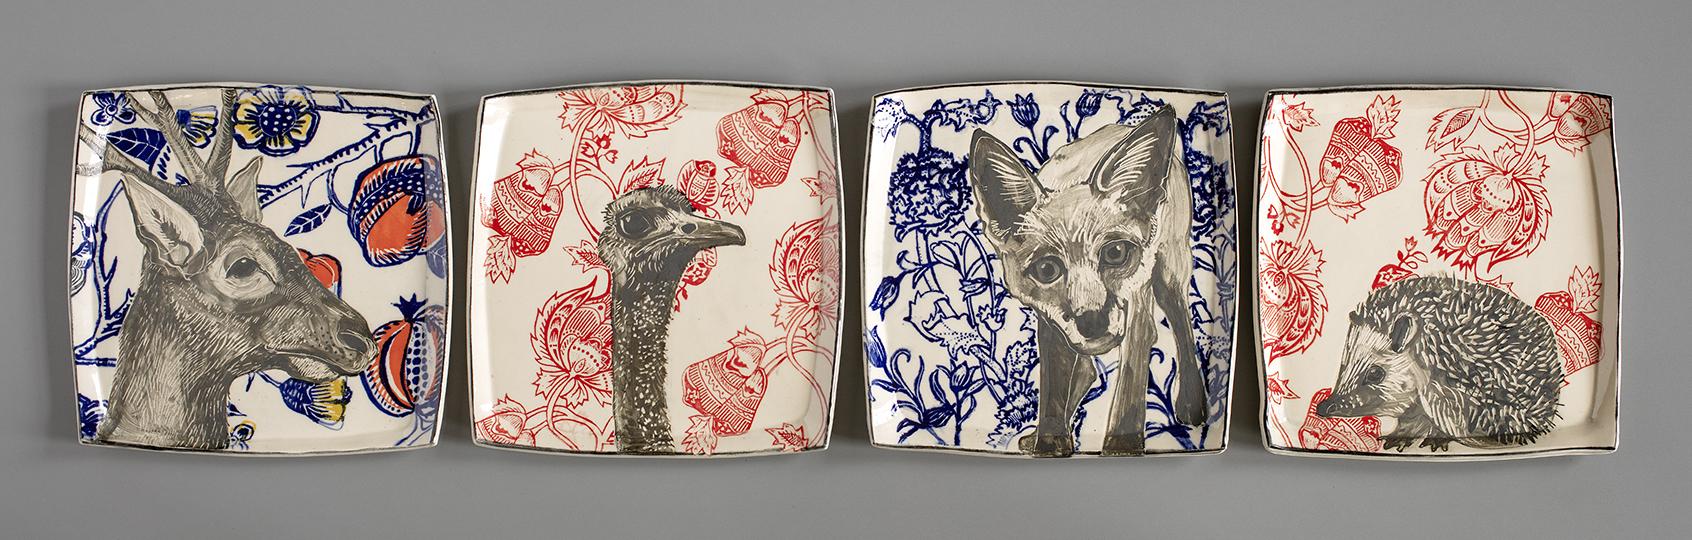 72 elk ostrich fox hedgehog plates.jpg